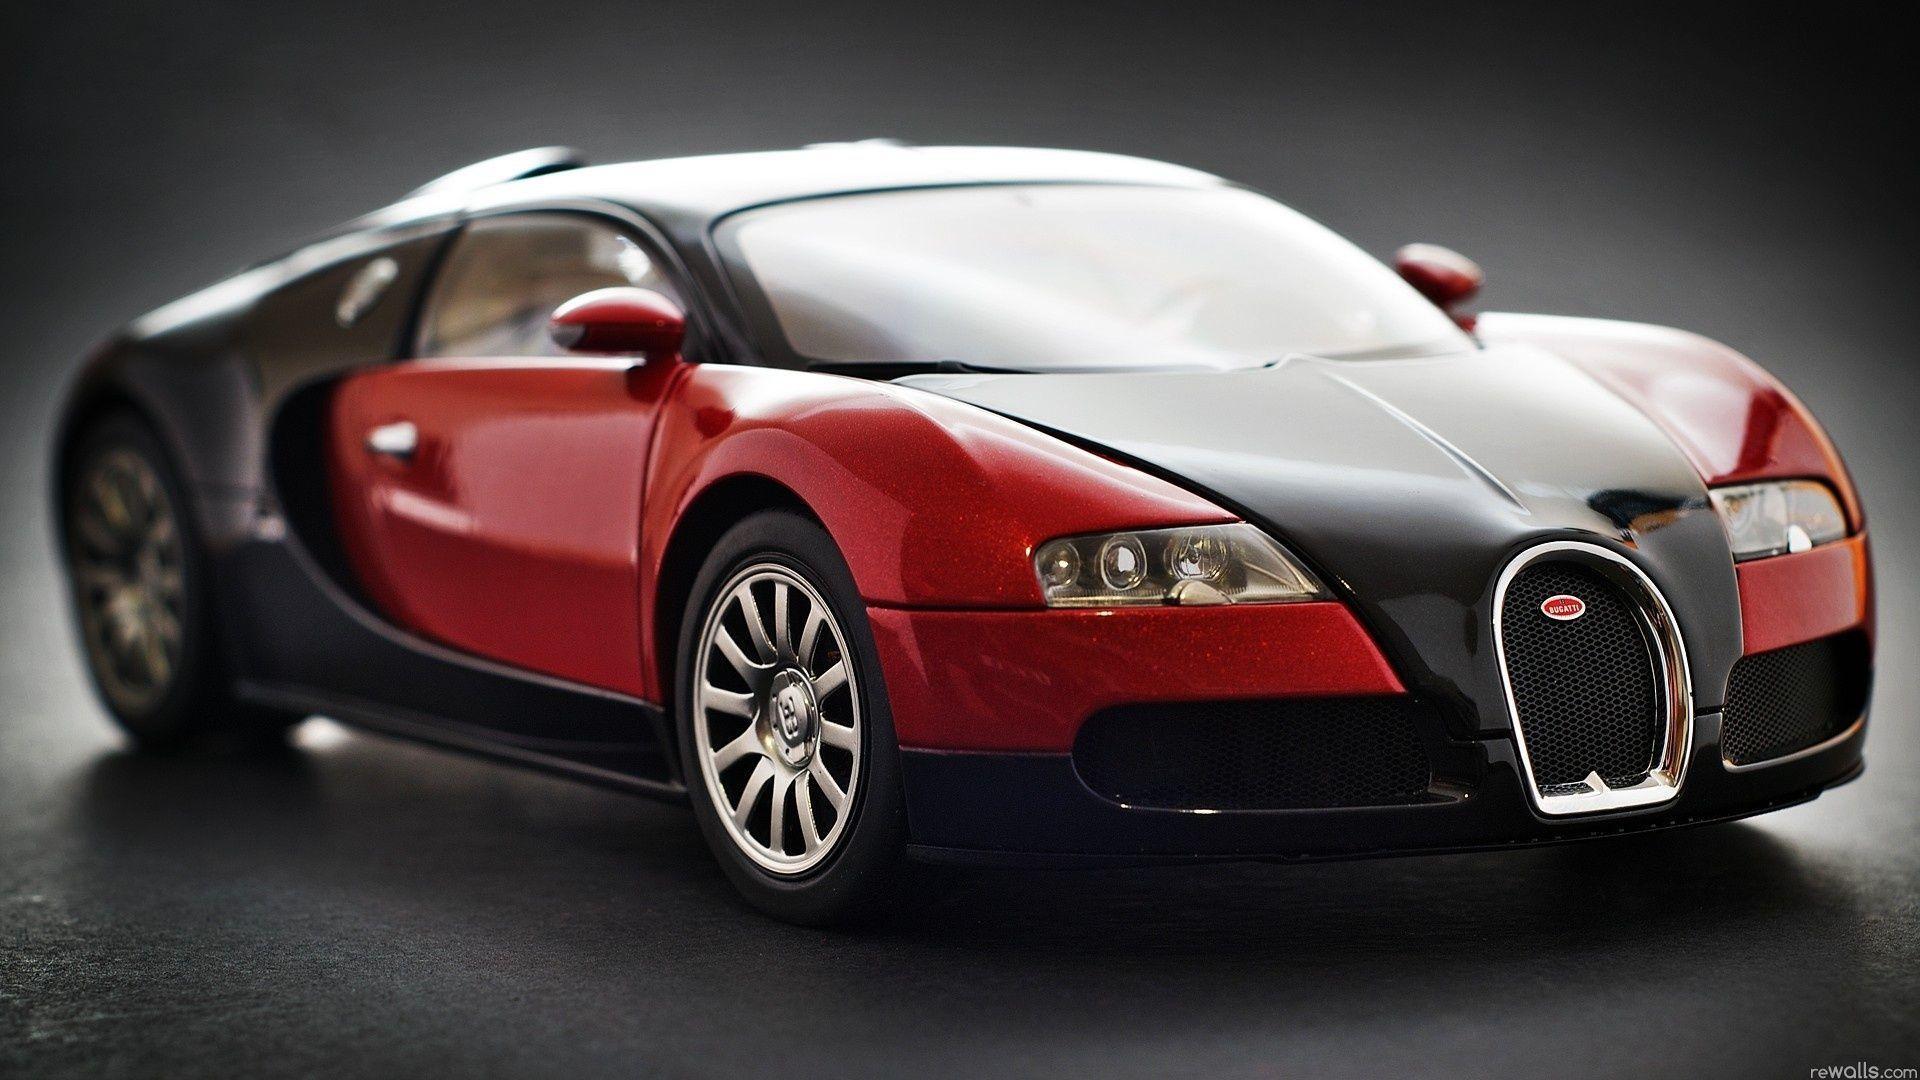 Gold Bugatti Veyron Car Wallpapers - Top Free Gold Bugatti ...